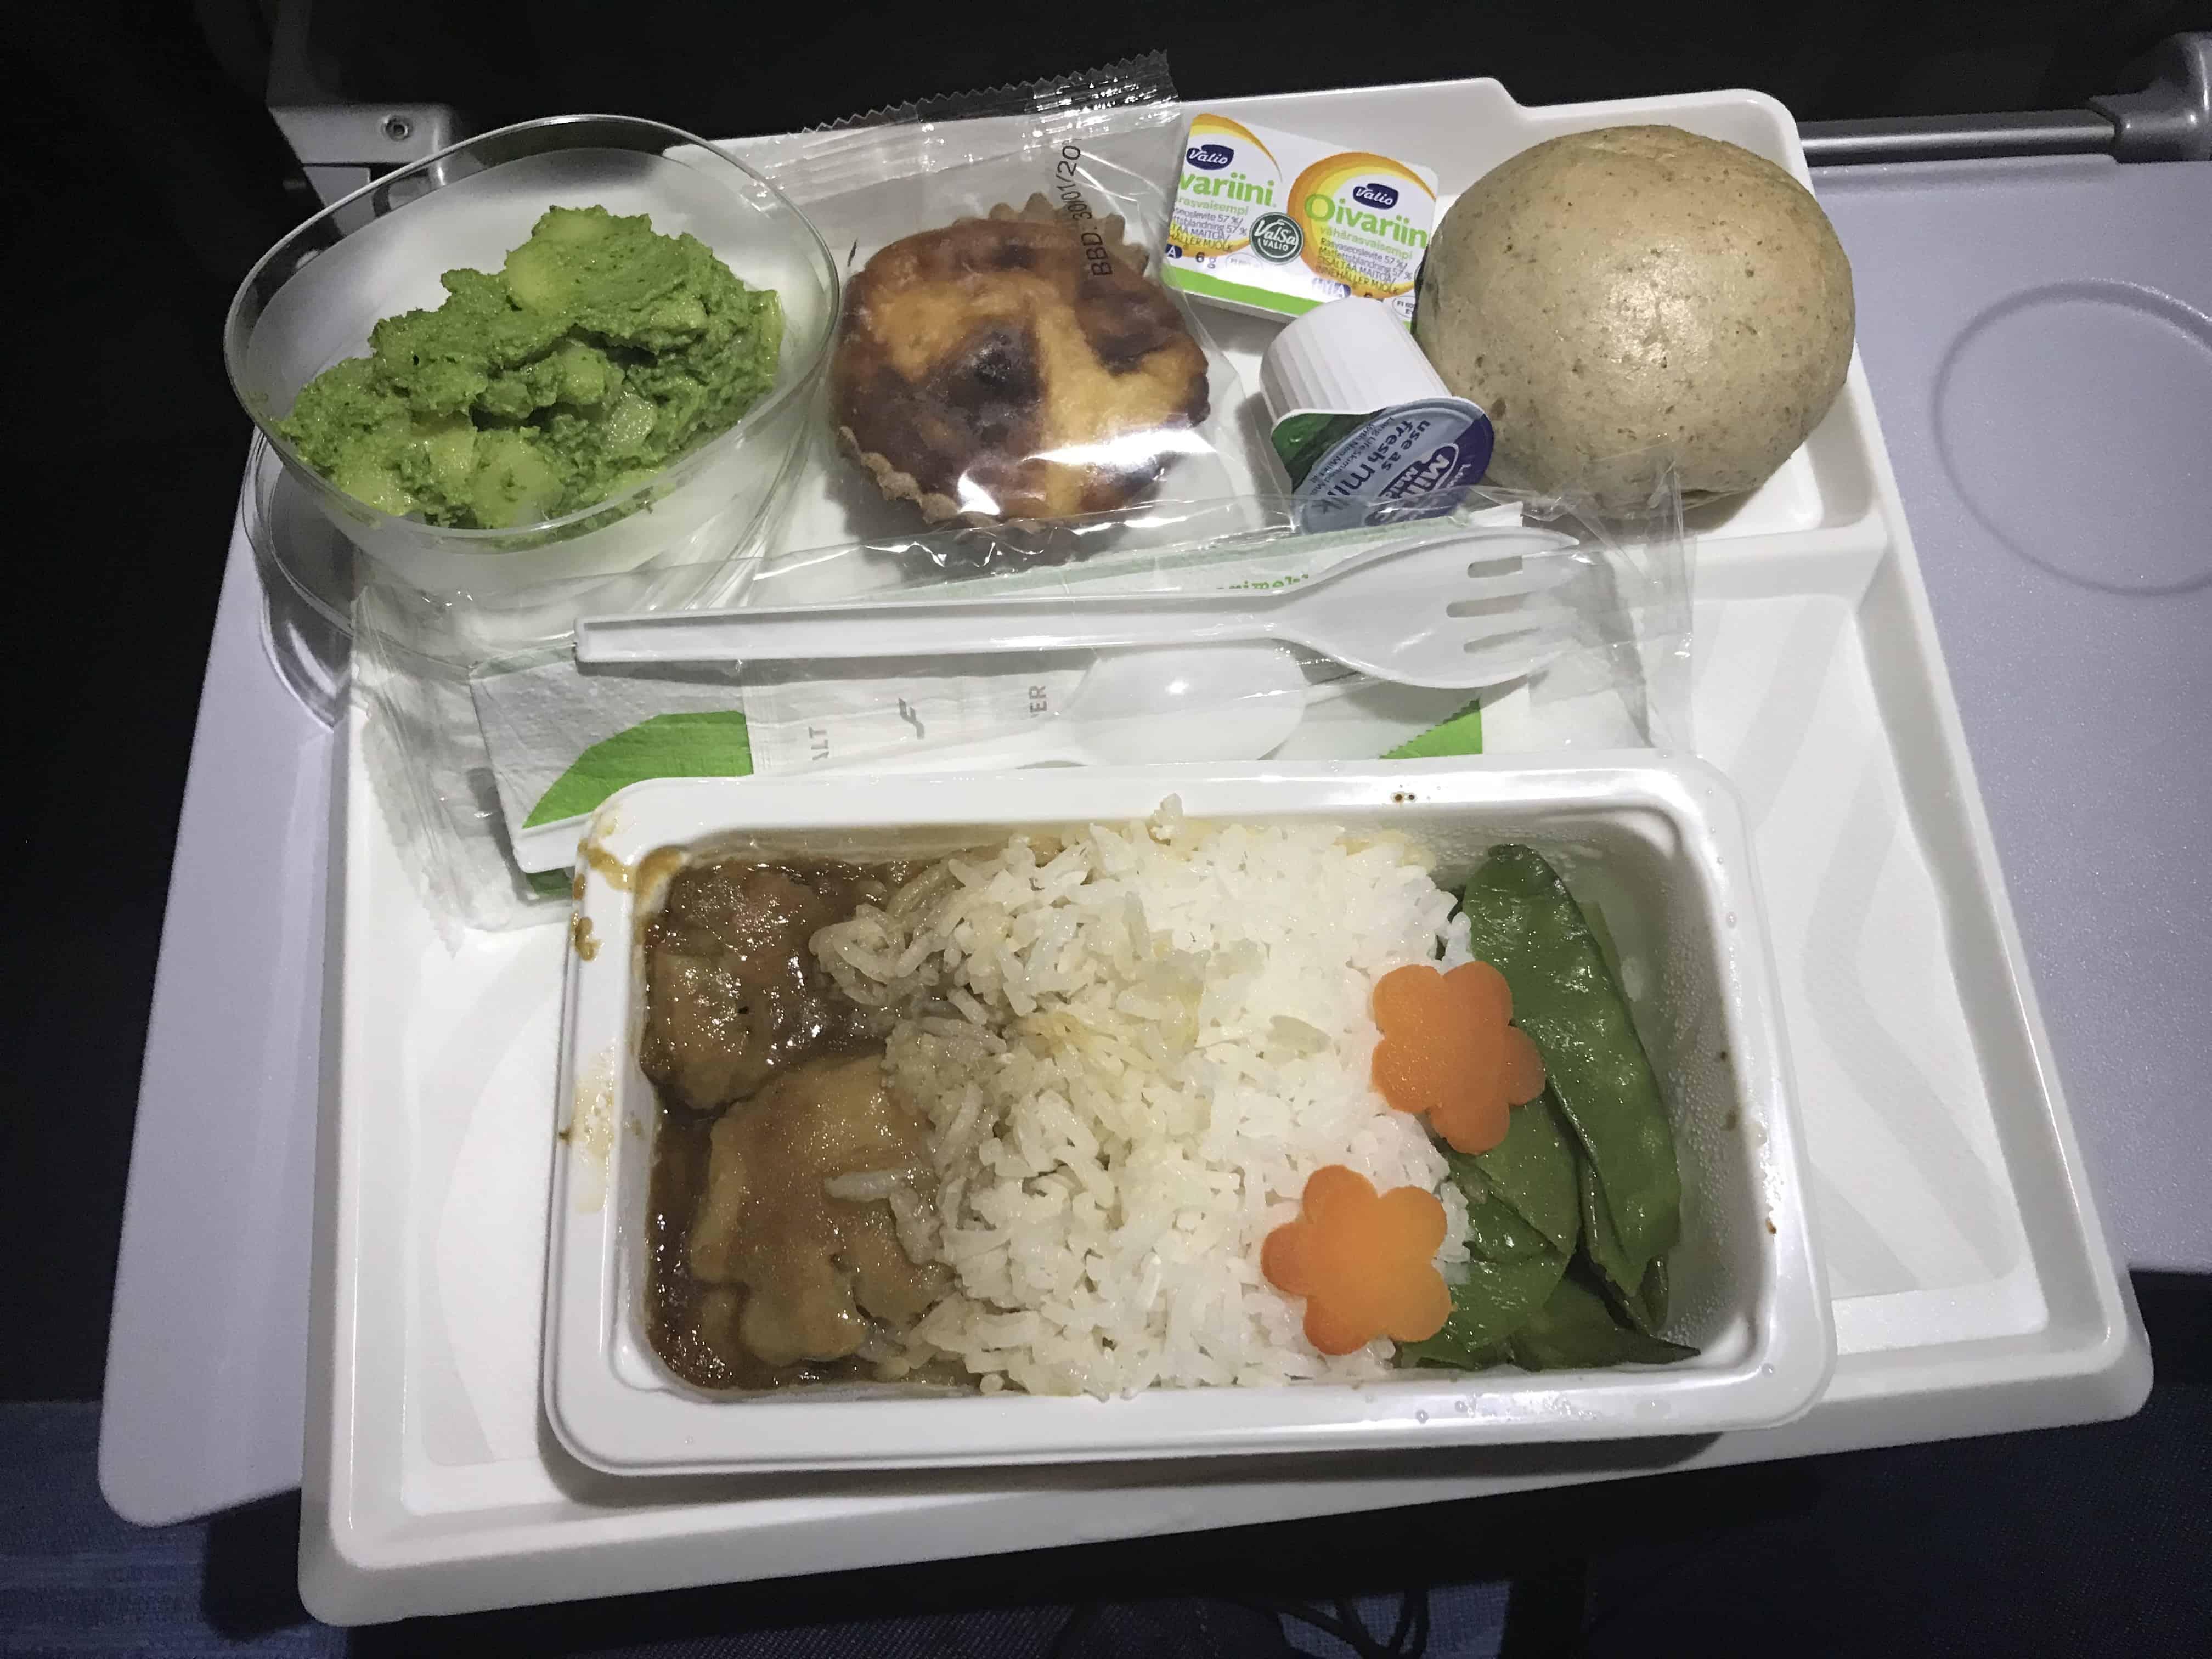 Finnair Bewertung Essen